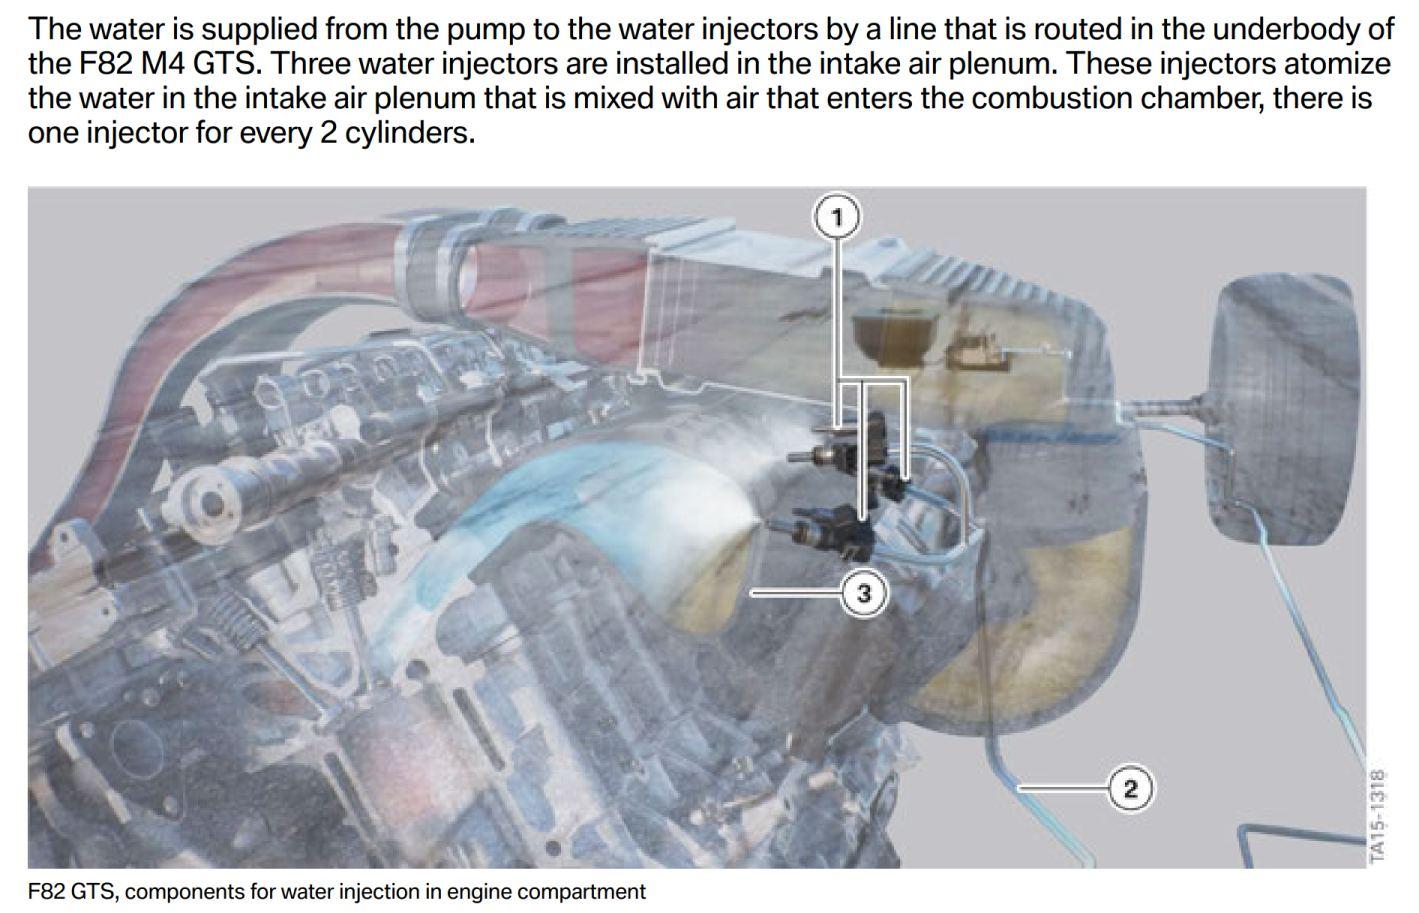 water-inj1.jpg